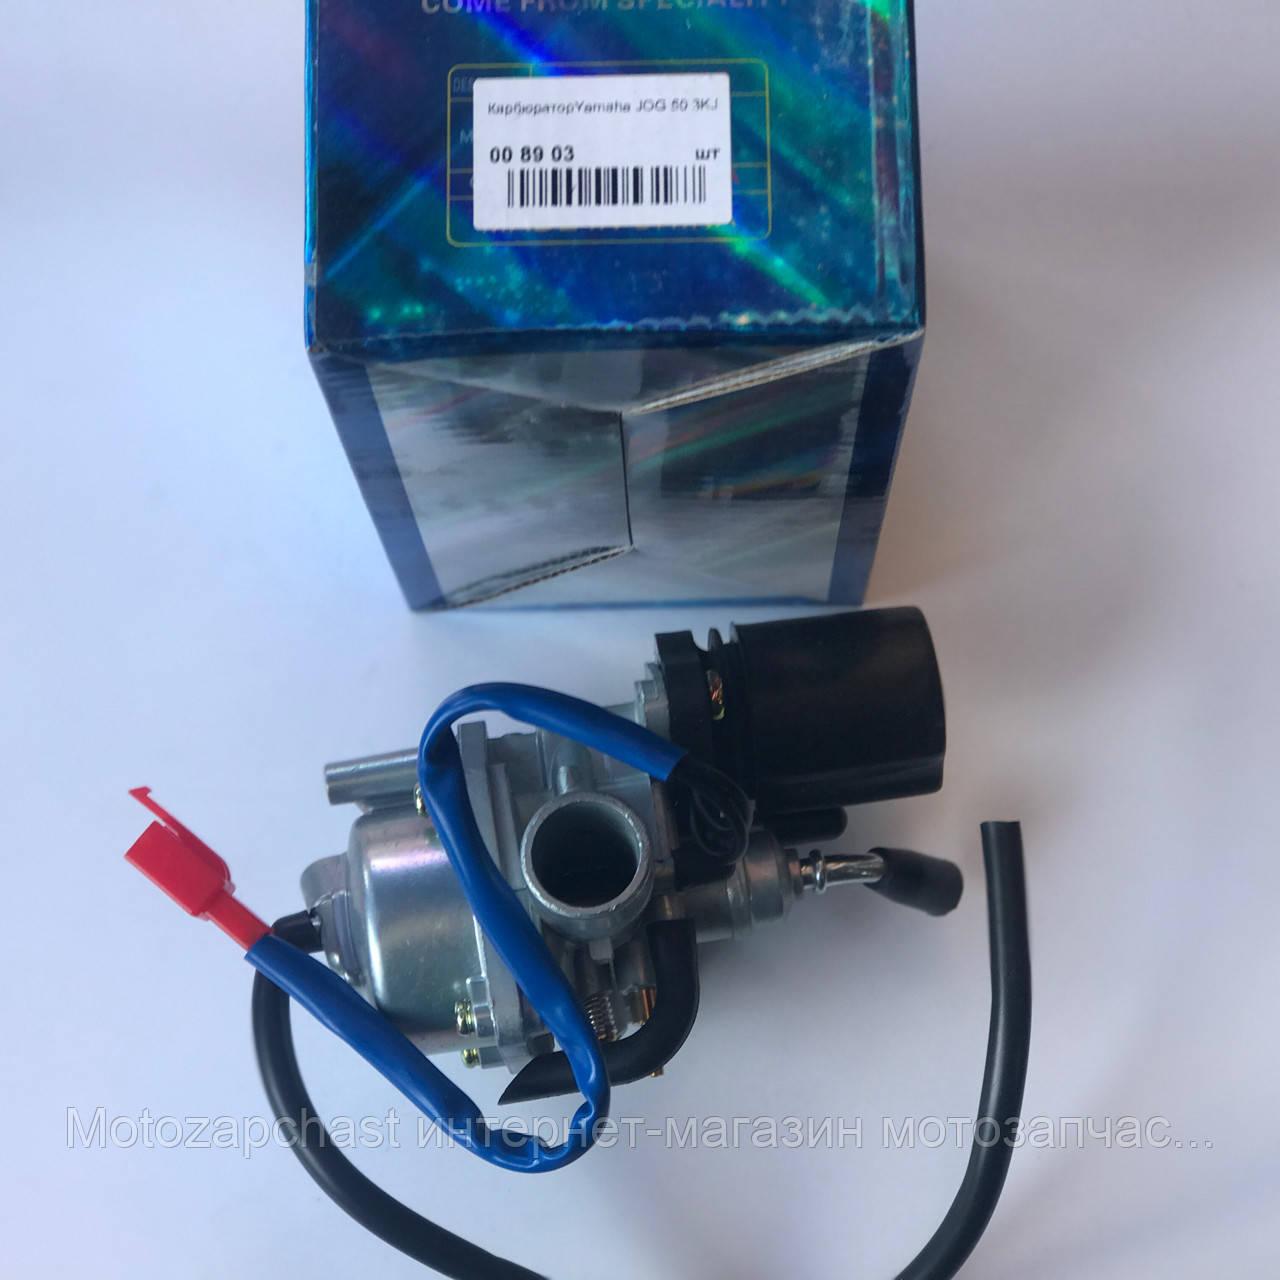 Карбюратор Yamaha JOG-50 (3KJ) LIPAI